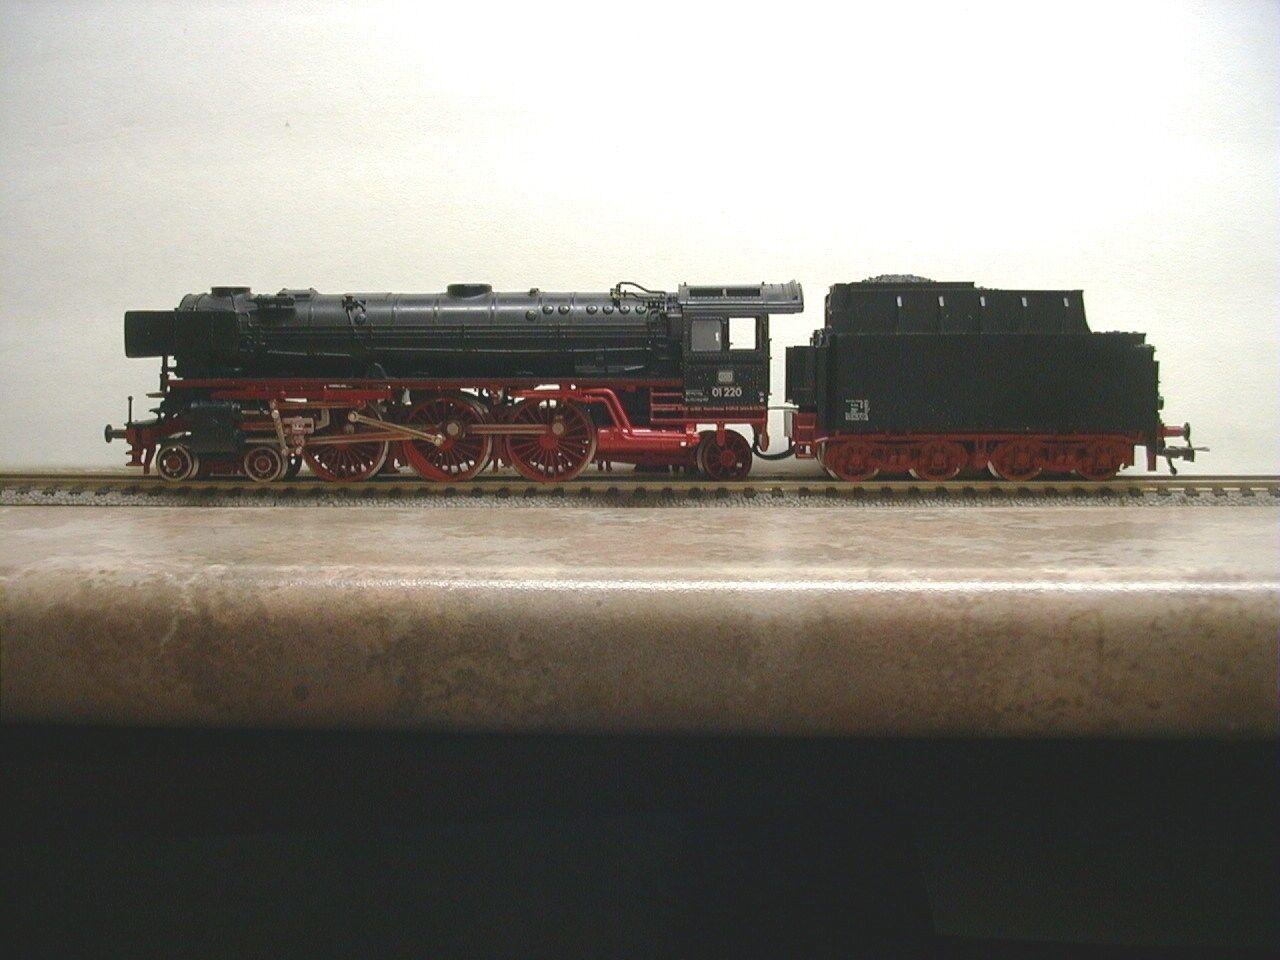 Fleischmann nr 4170 4 -6 -2 Pacific Tender loco